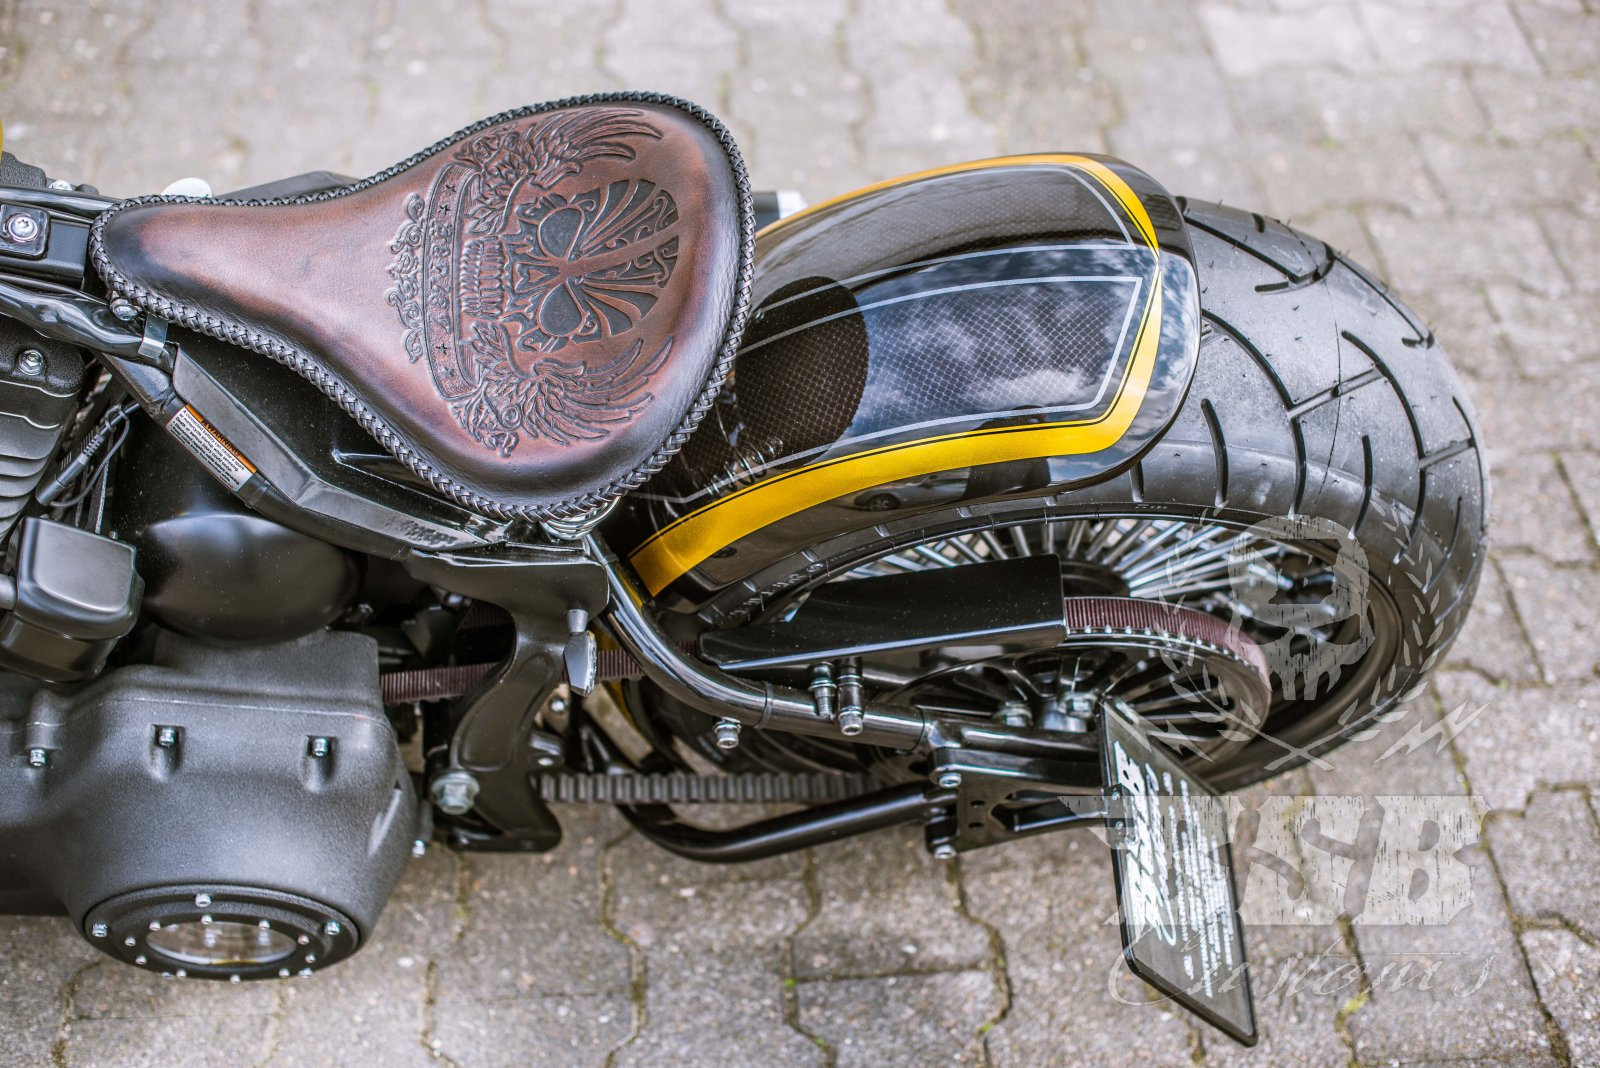 ADN Fat spoke pulley poulie à courroie 70 z.1 1//8 Harley Davidson Heritage softail